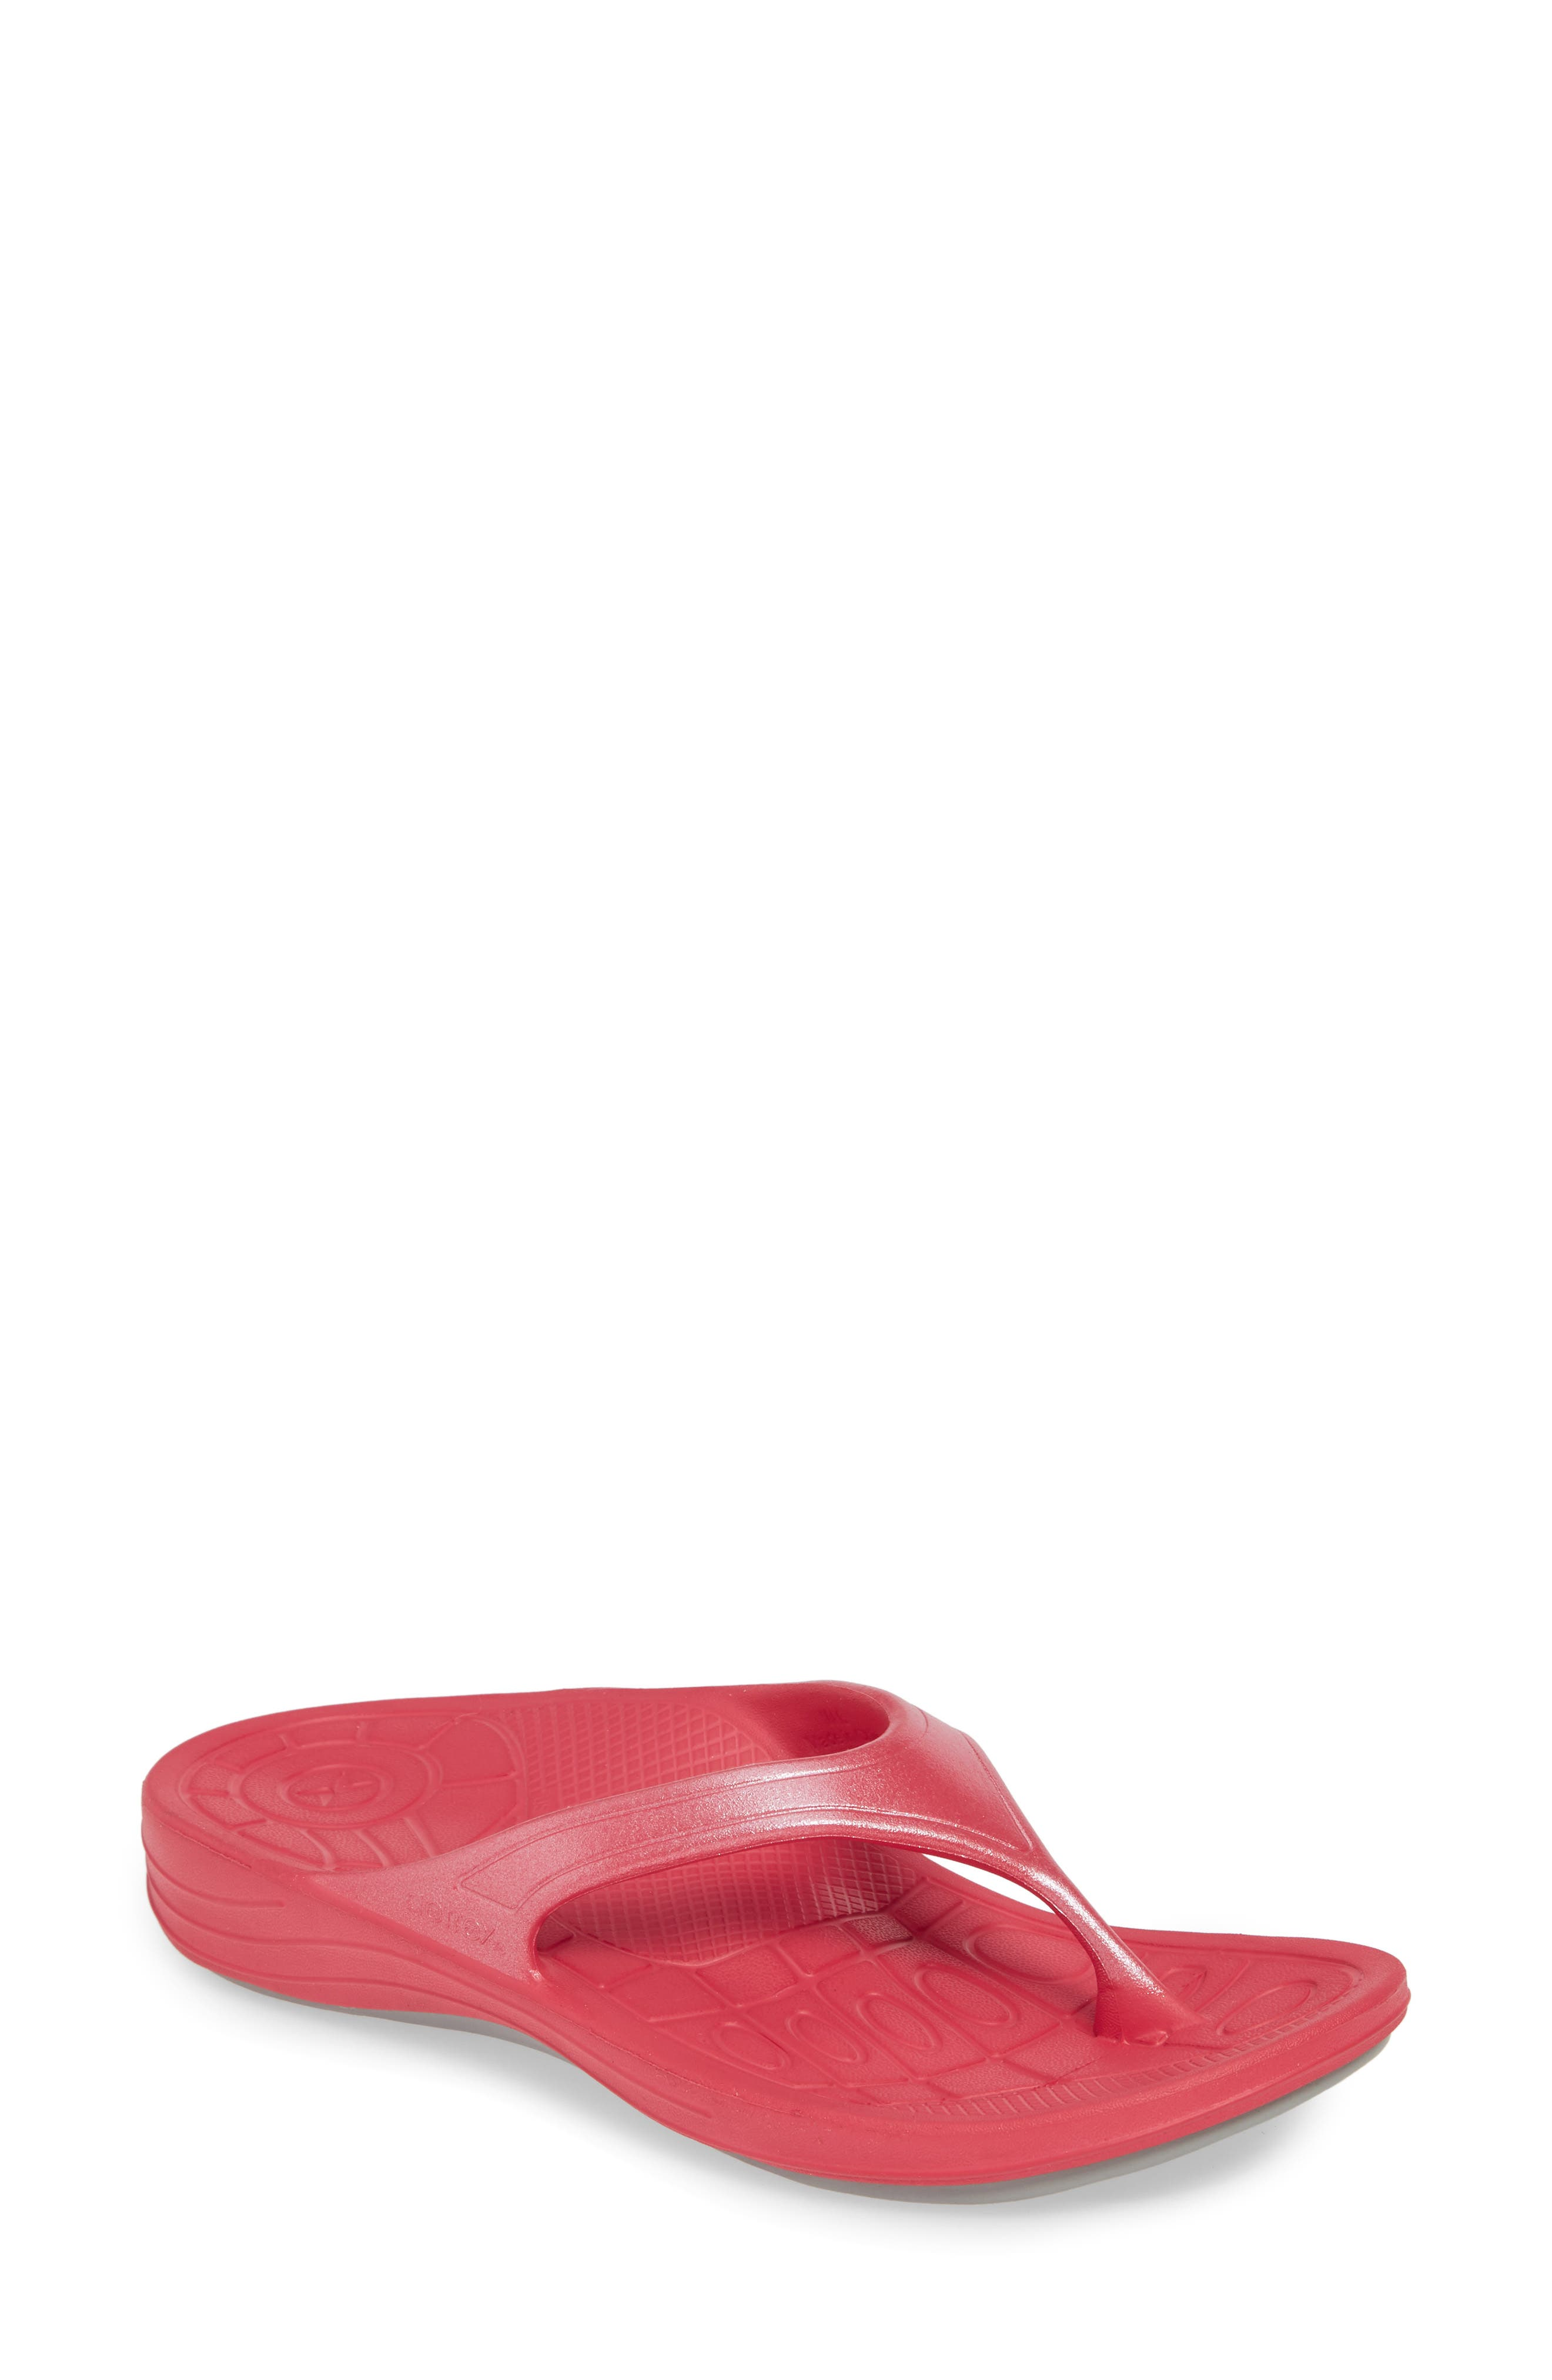 Aetrex Fiji Flip Flop, Pink